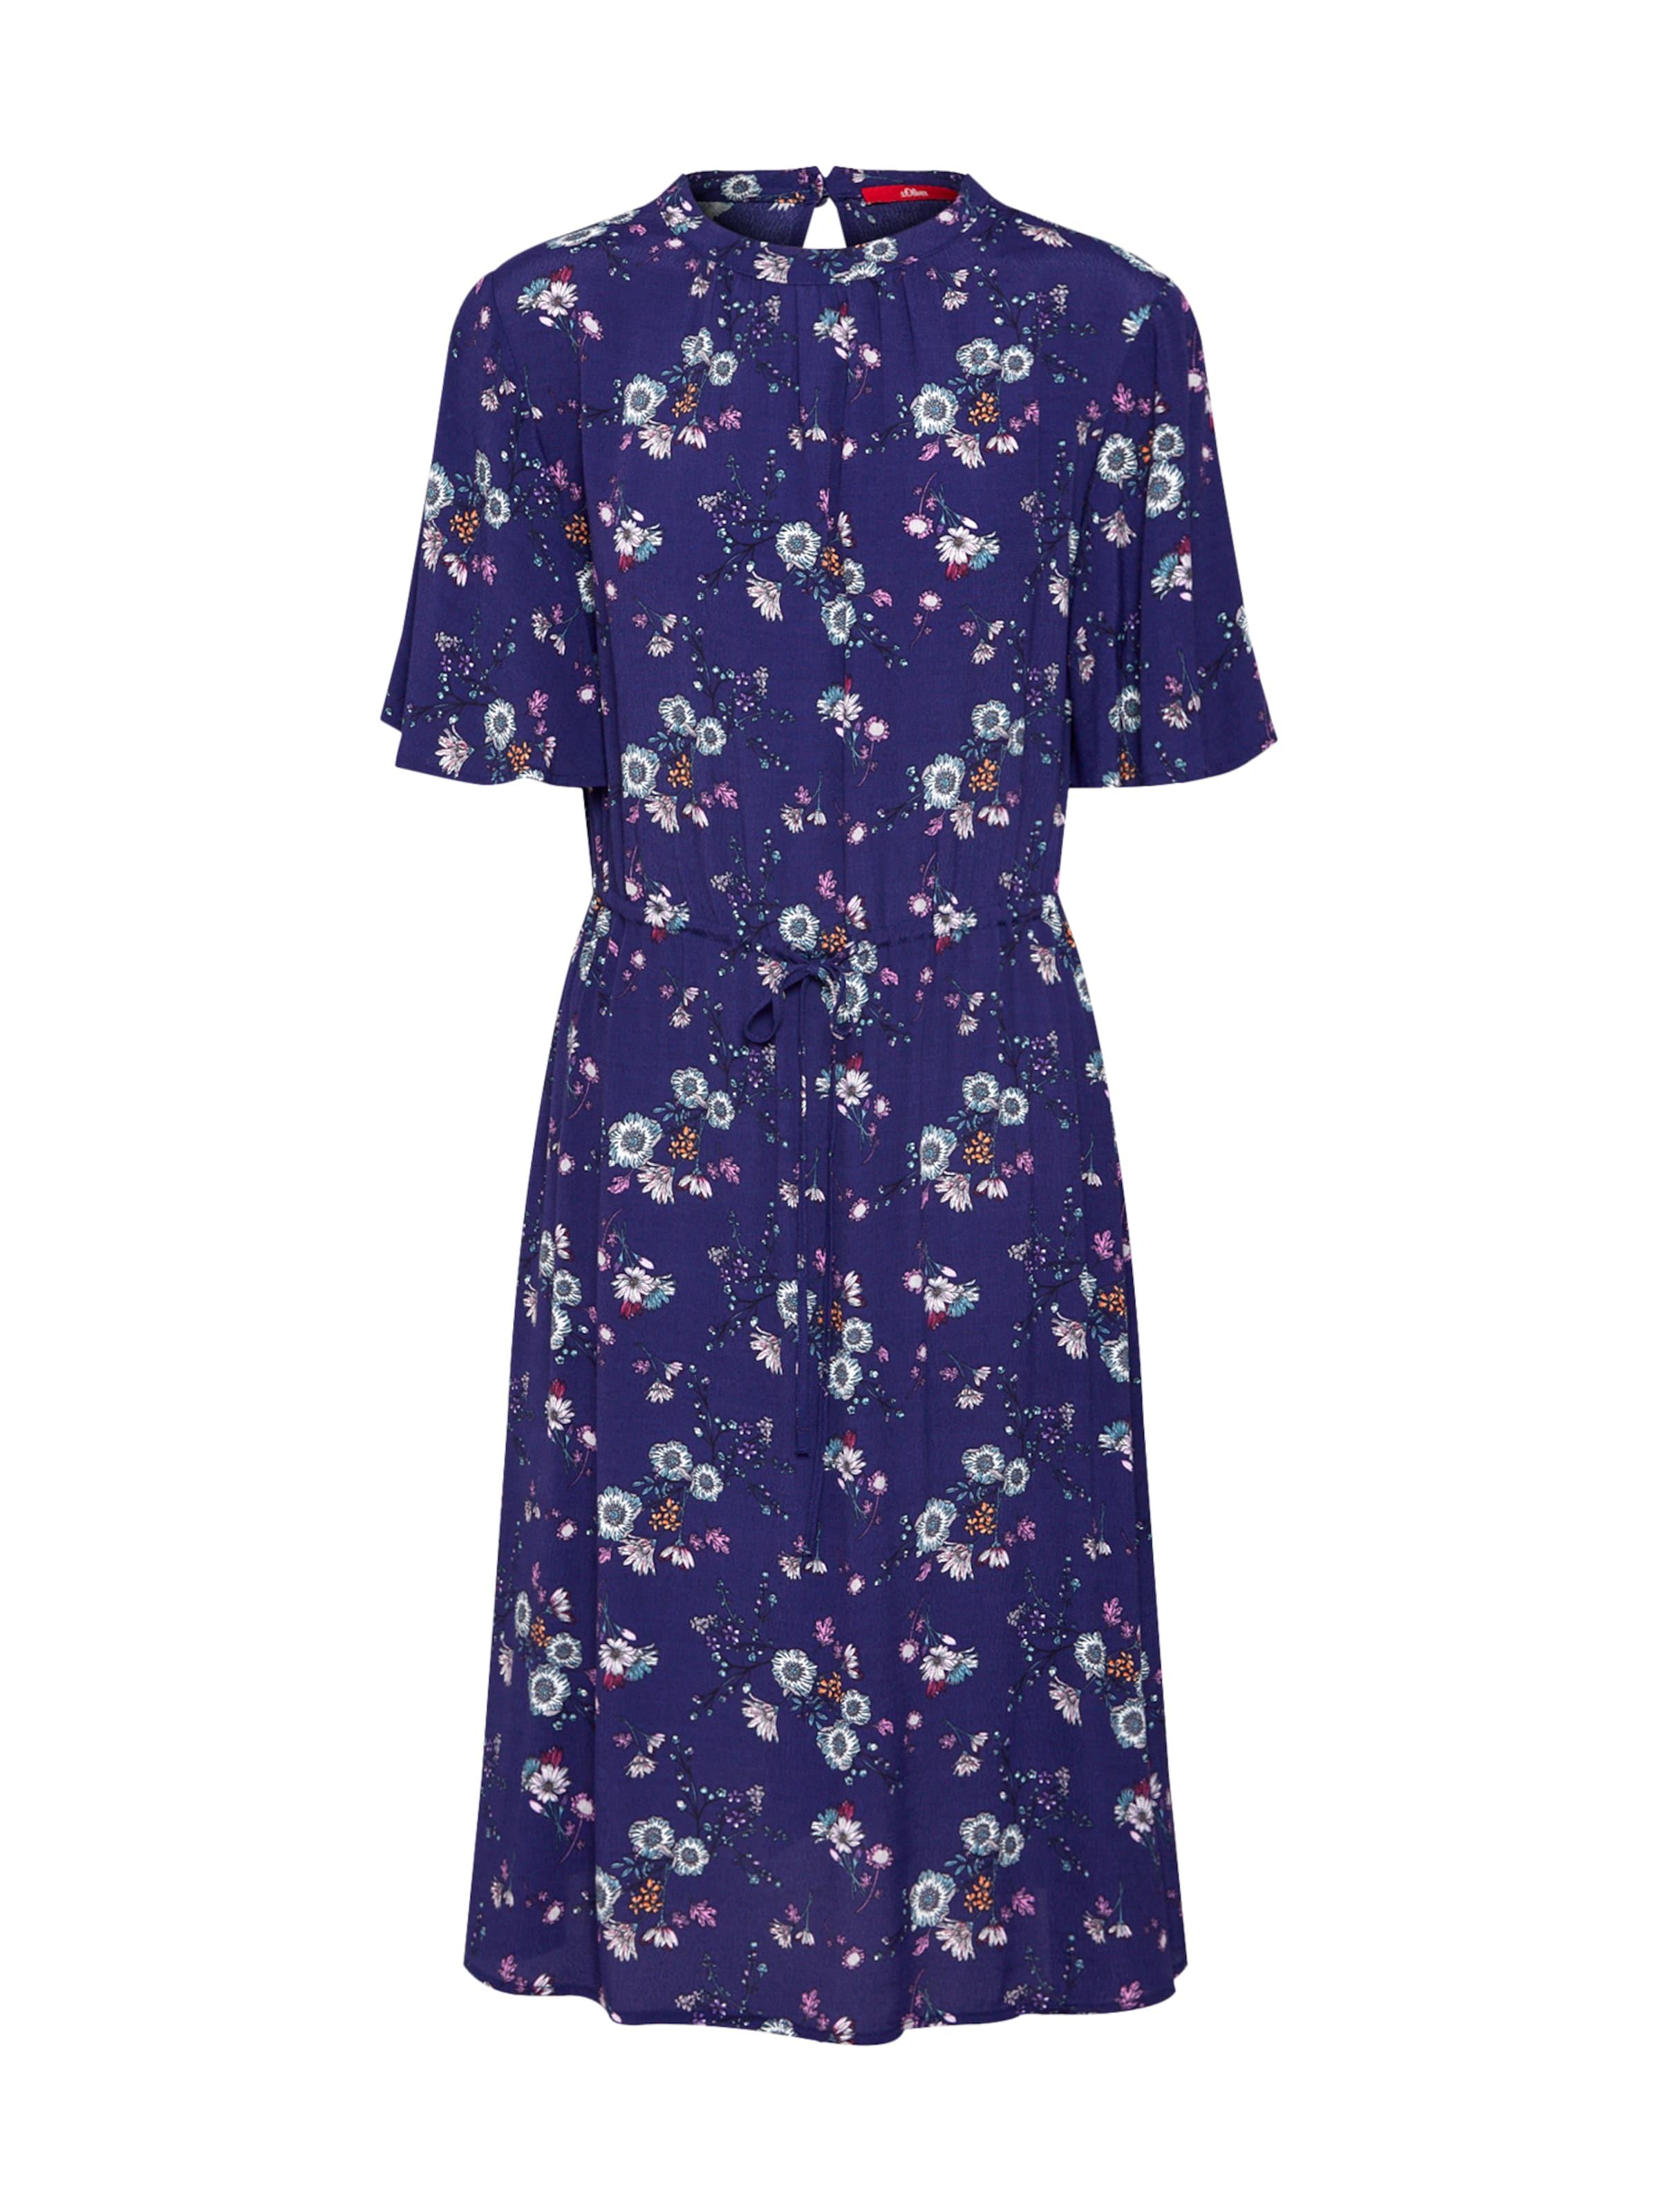 Red BlauMischfarben Kleid oliver In S Label qUjSzMpGLV